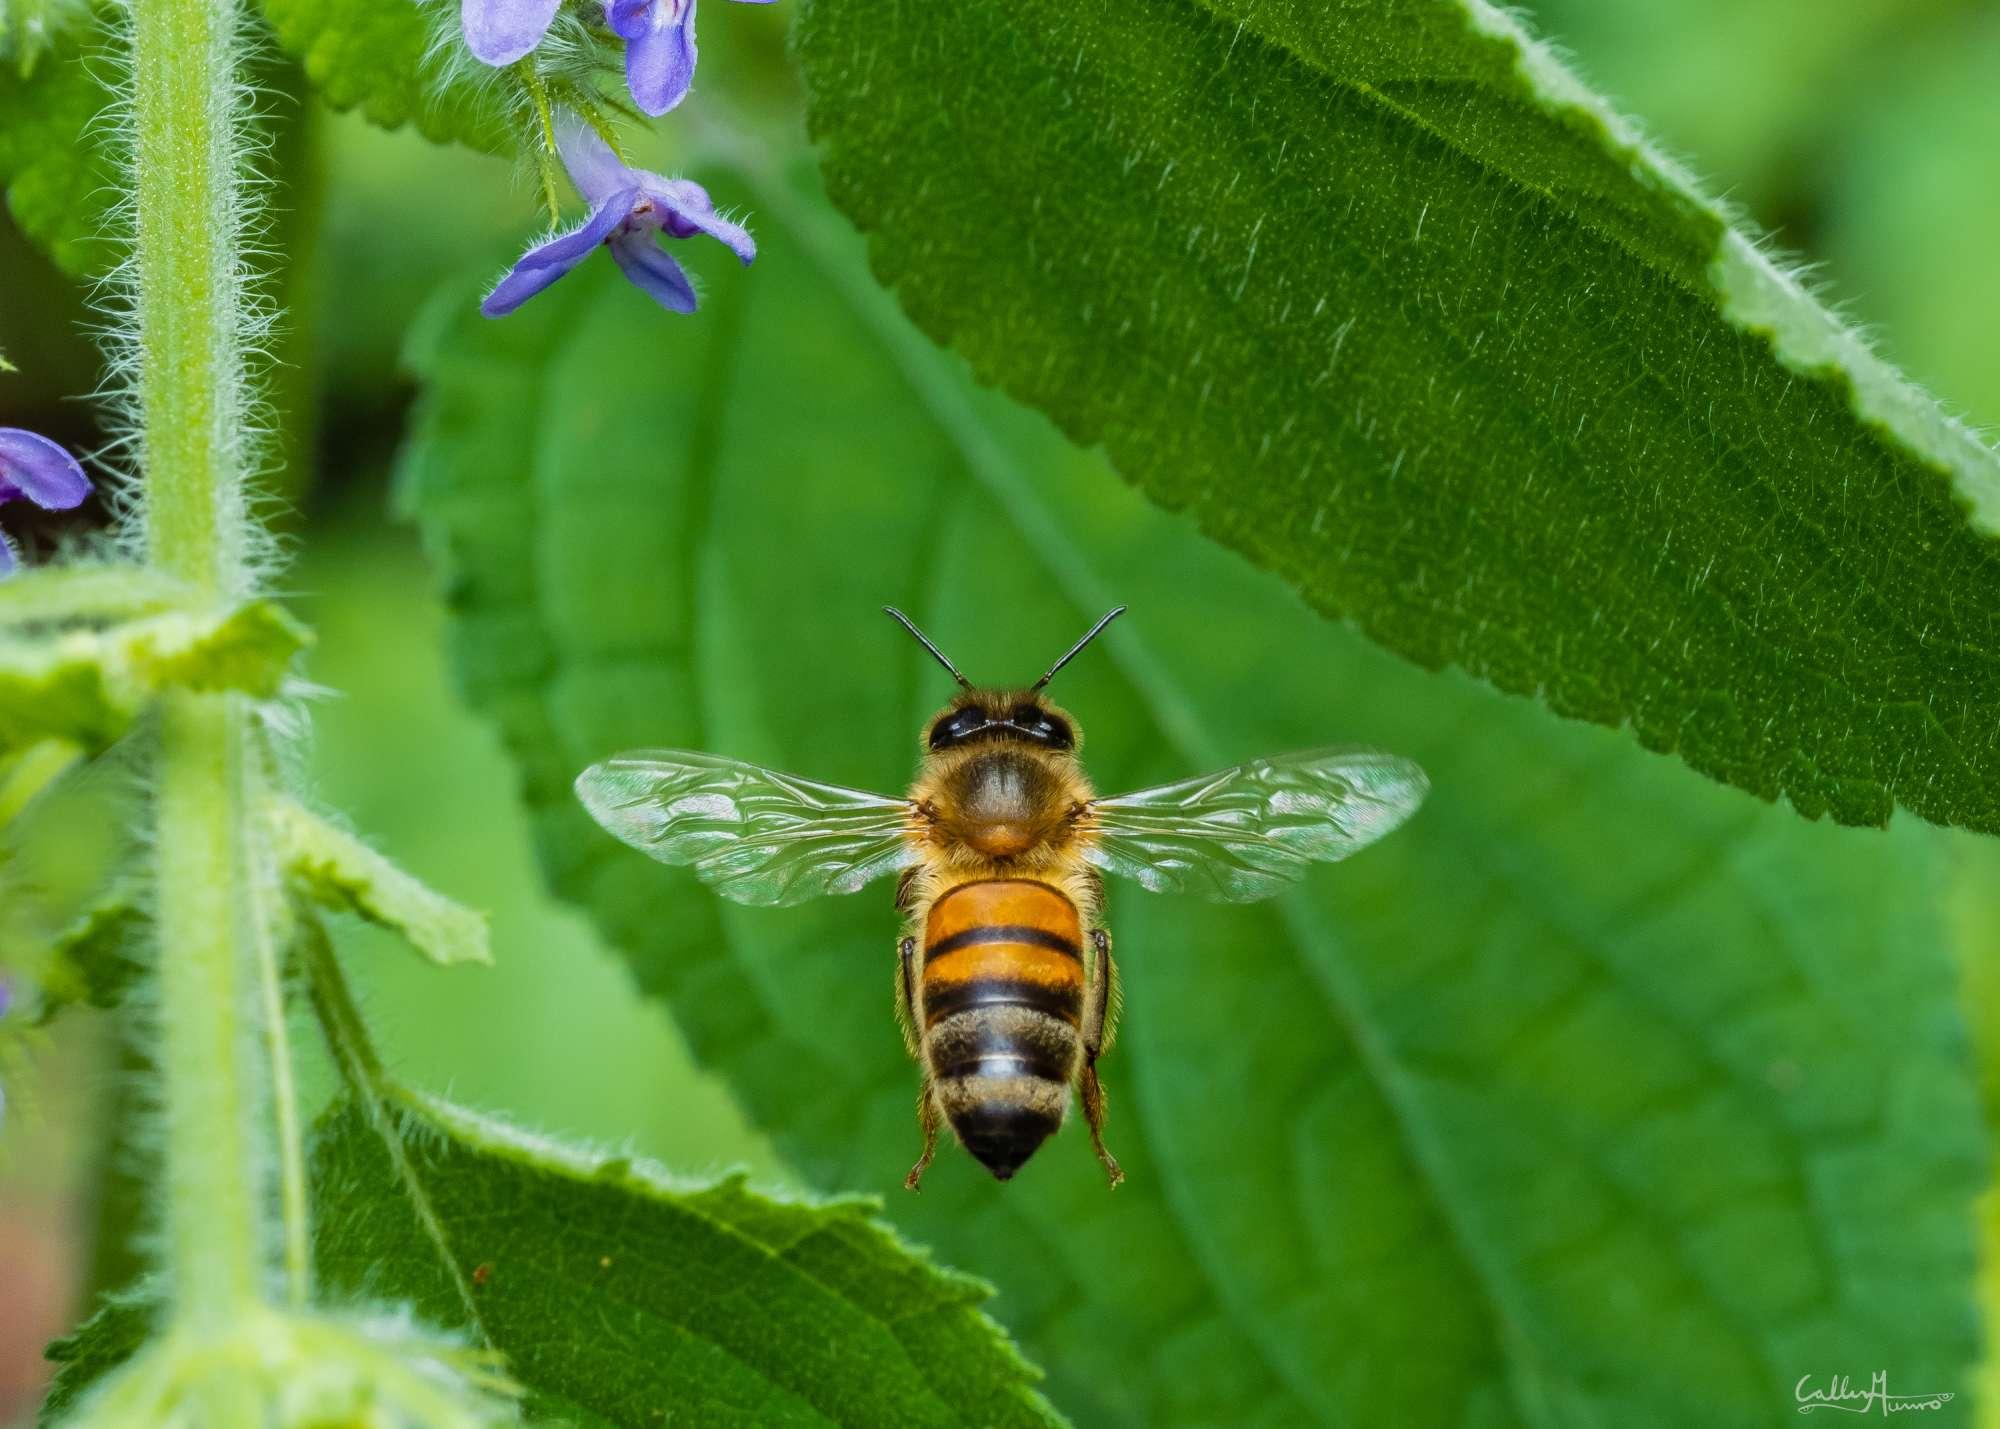 Bees Macro Photography closeup of European Honey Bees (Apis mellifera)